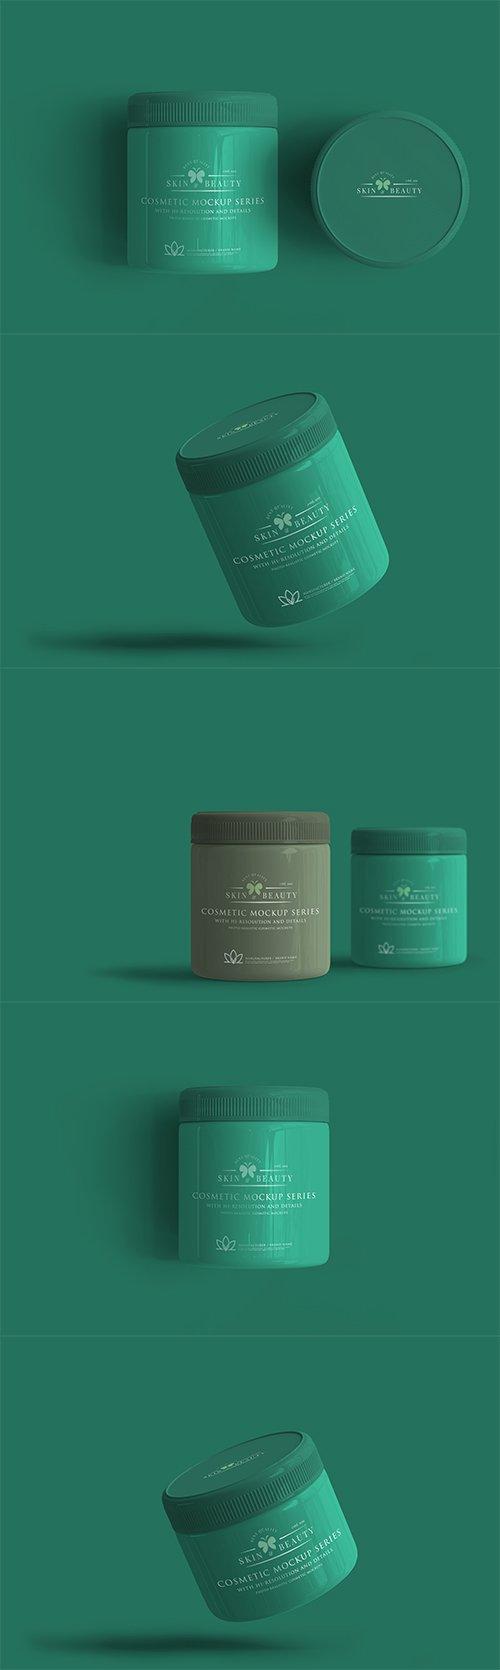 Cosmetic Jar Mockup Pack